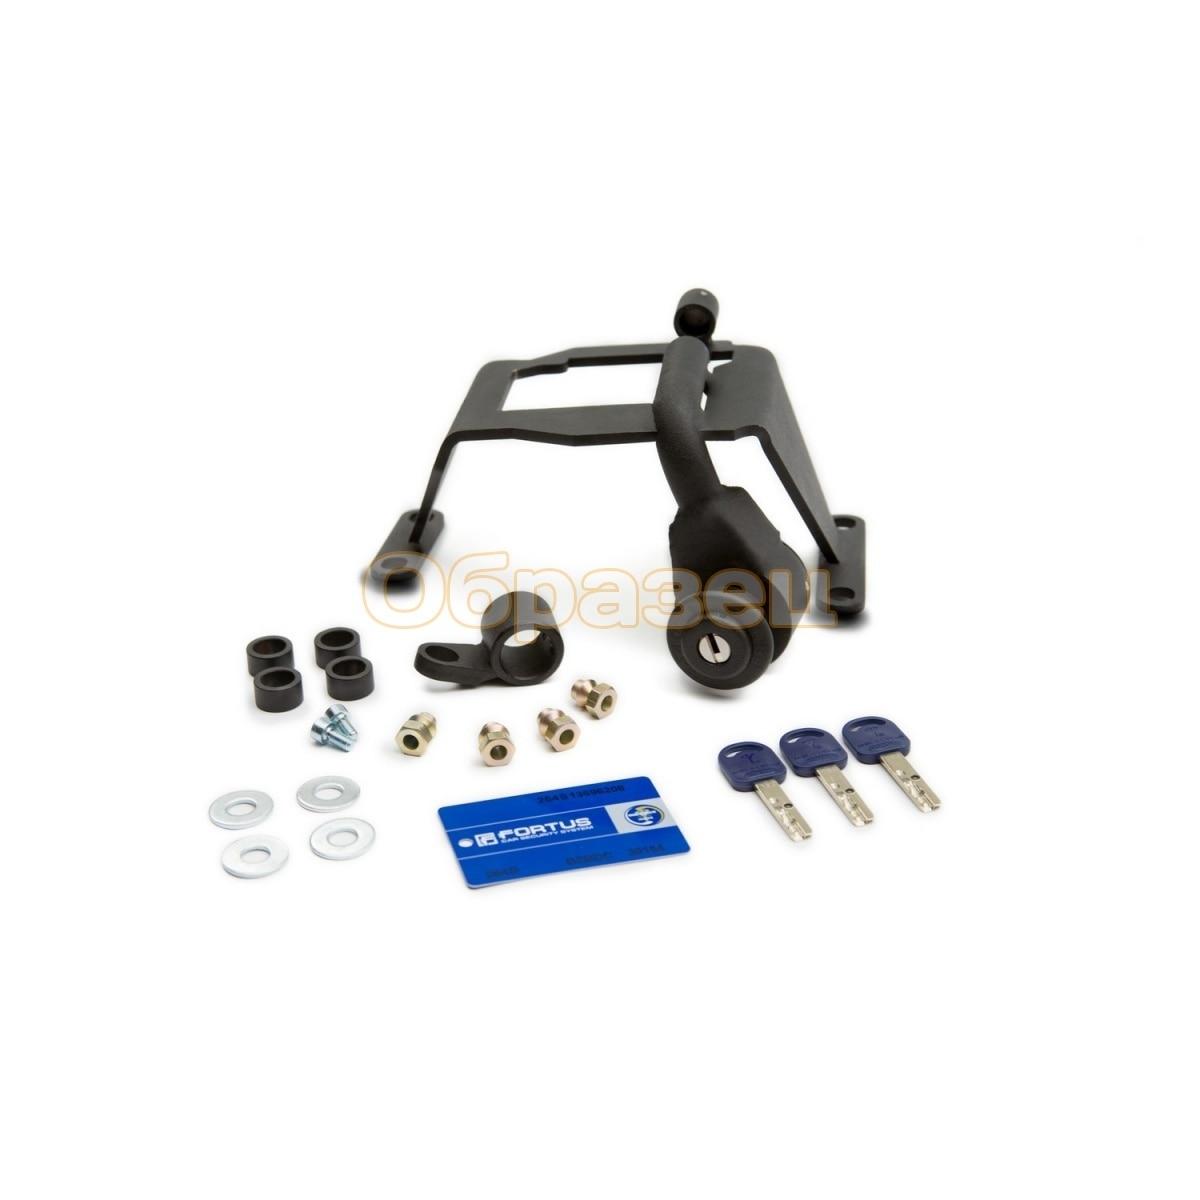 Gearbox lock (MTL) 2192 INT for Toyota RAV4 2013   6MT (Toyota) Car Steering Wheel Lock     - title=